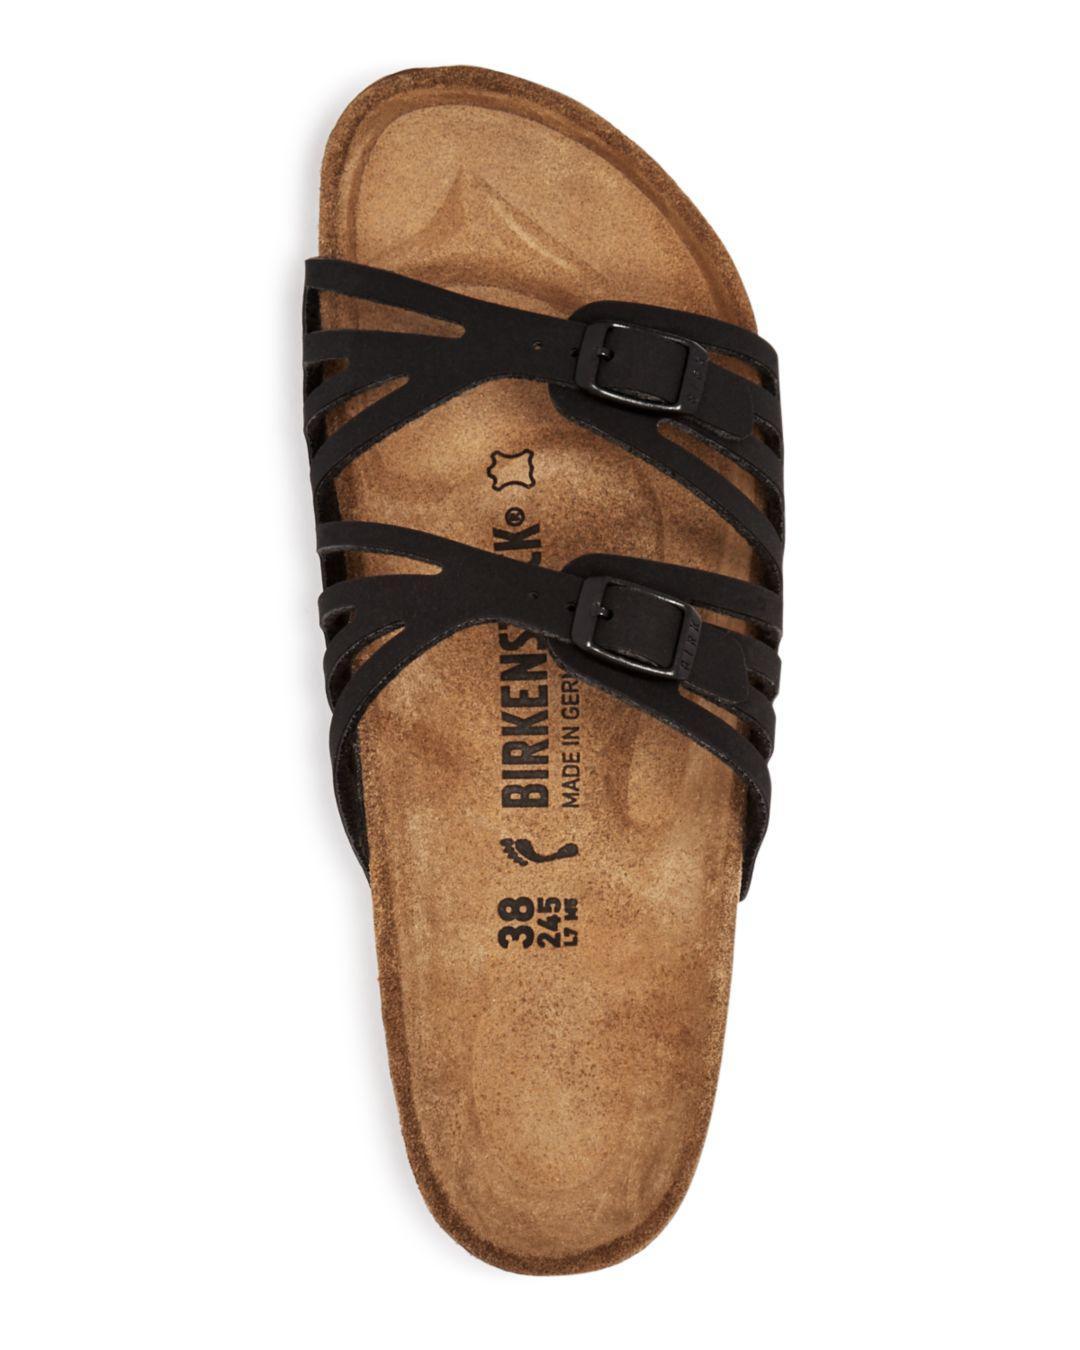 5b4dd22ac3a4 Lyst - Birkenstock Women s Granada Cutout Slide Sandals in Black